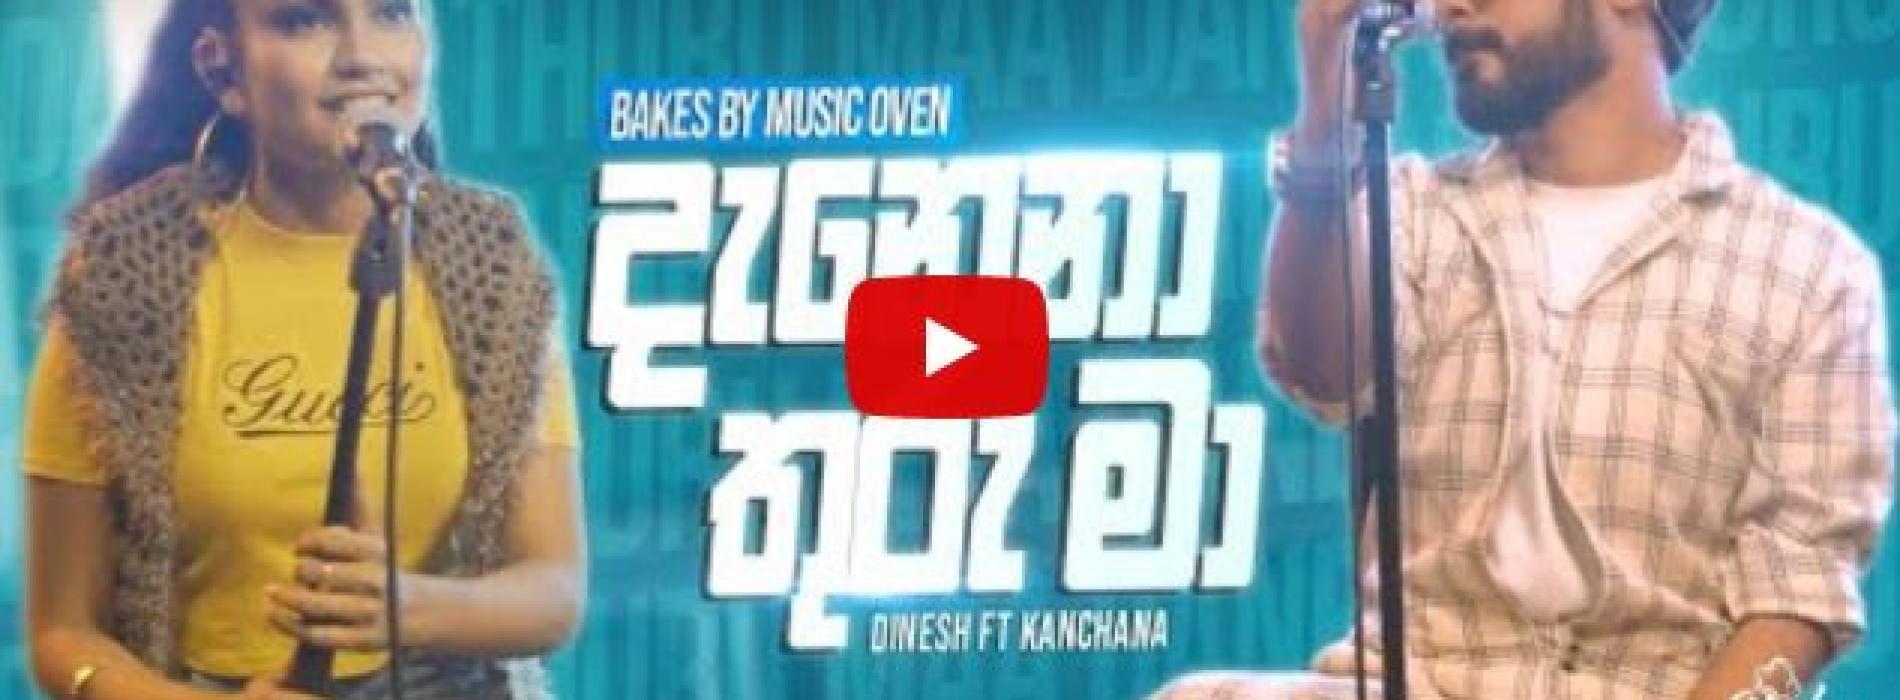 New Music : Danena Thuru ma (දැනෙනා තුරු මා) – Dinesh Gamage, Kanchana Anuradhi | Bakes by Music Oven Episode 02